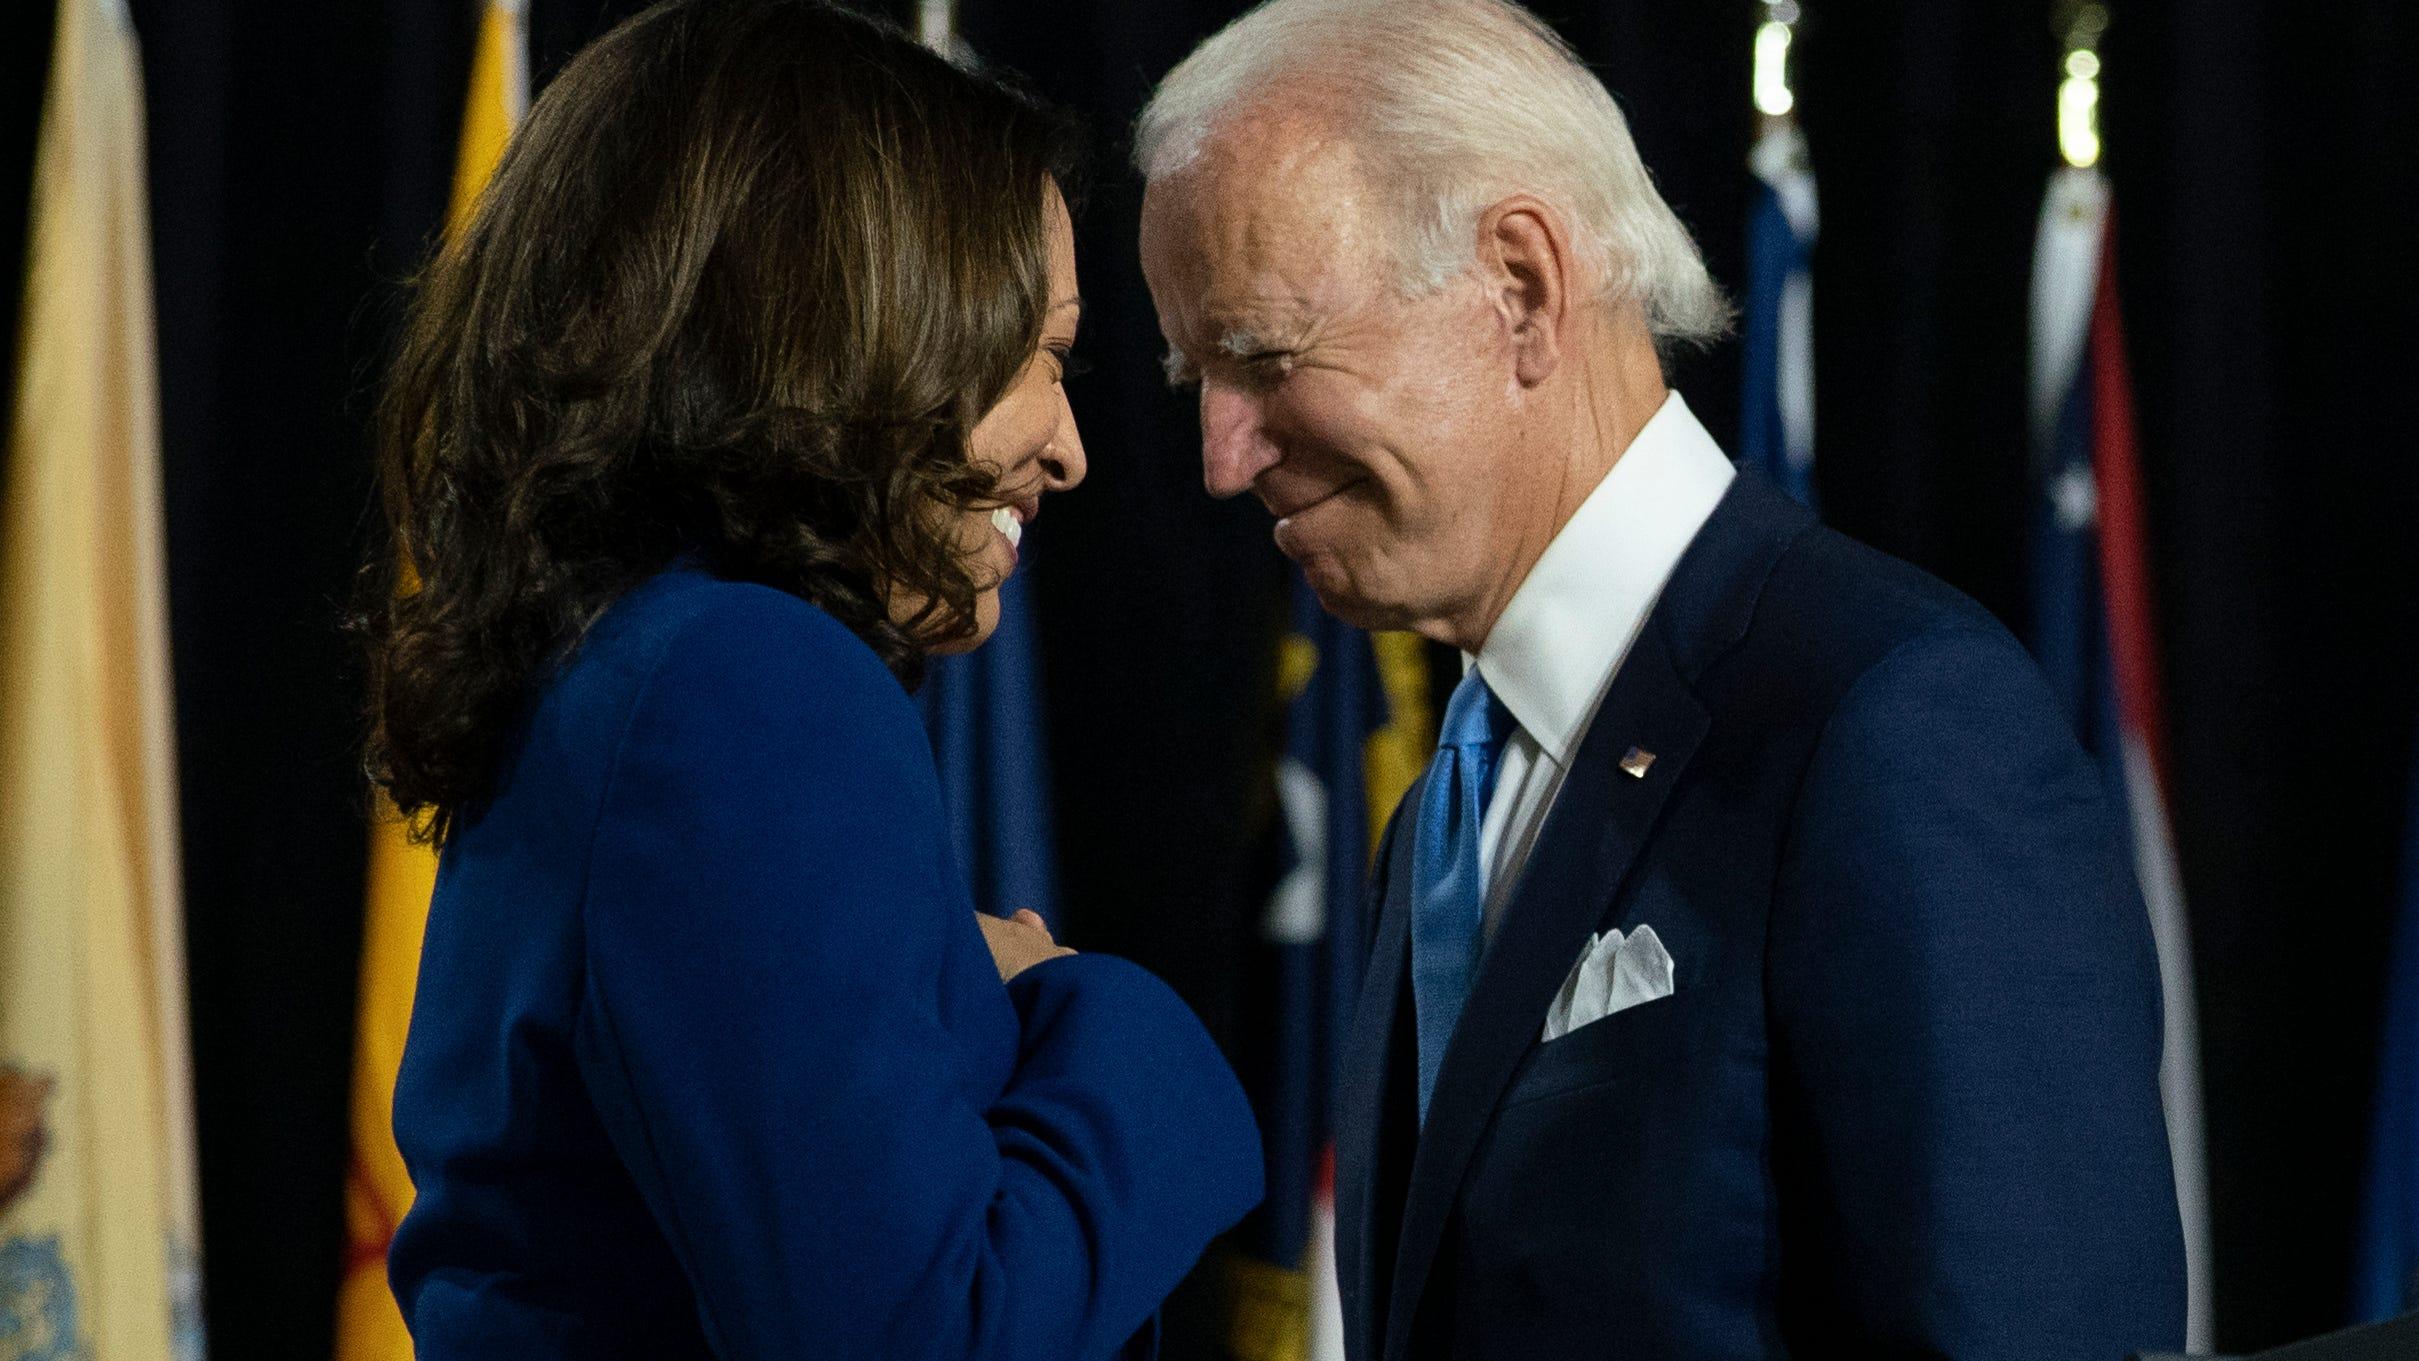 Joe Biden, Kamala Harris to make campaign appearance in Arizona